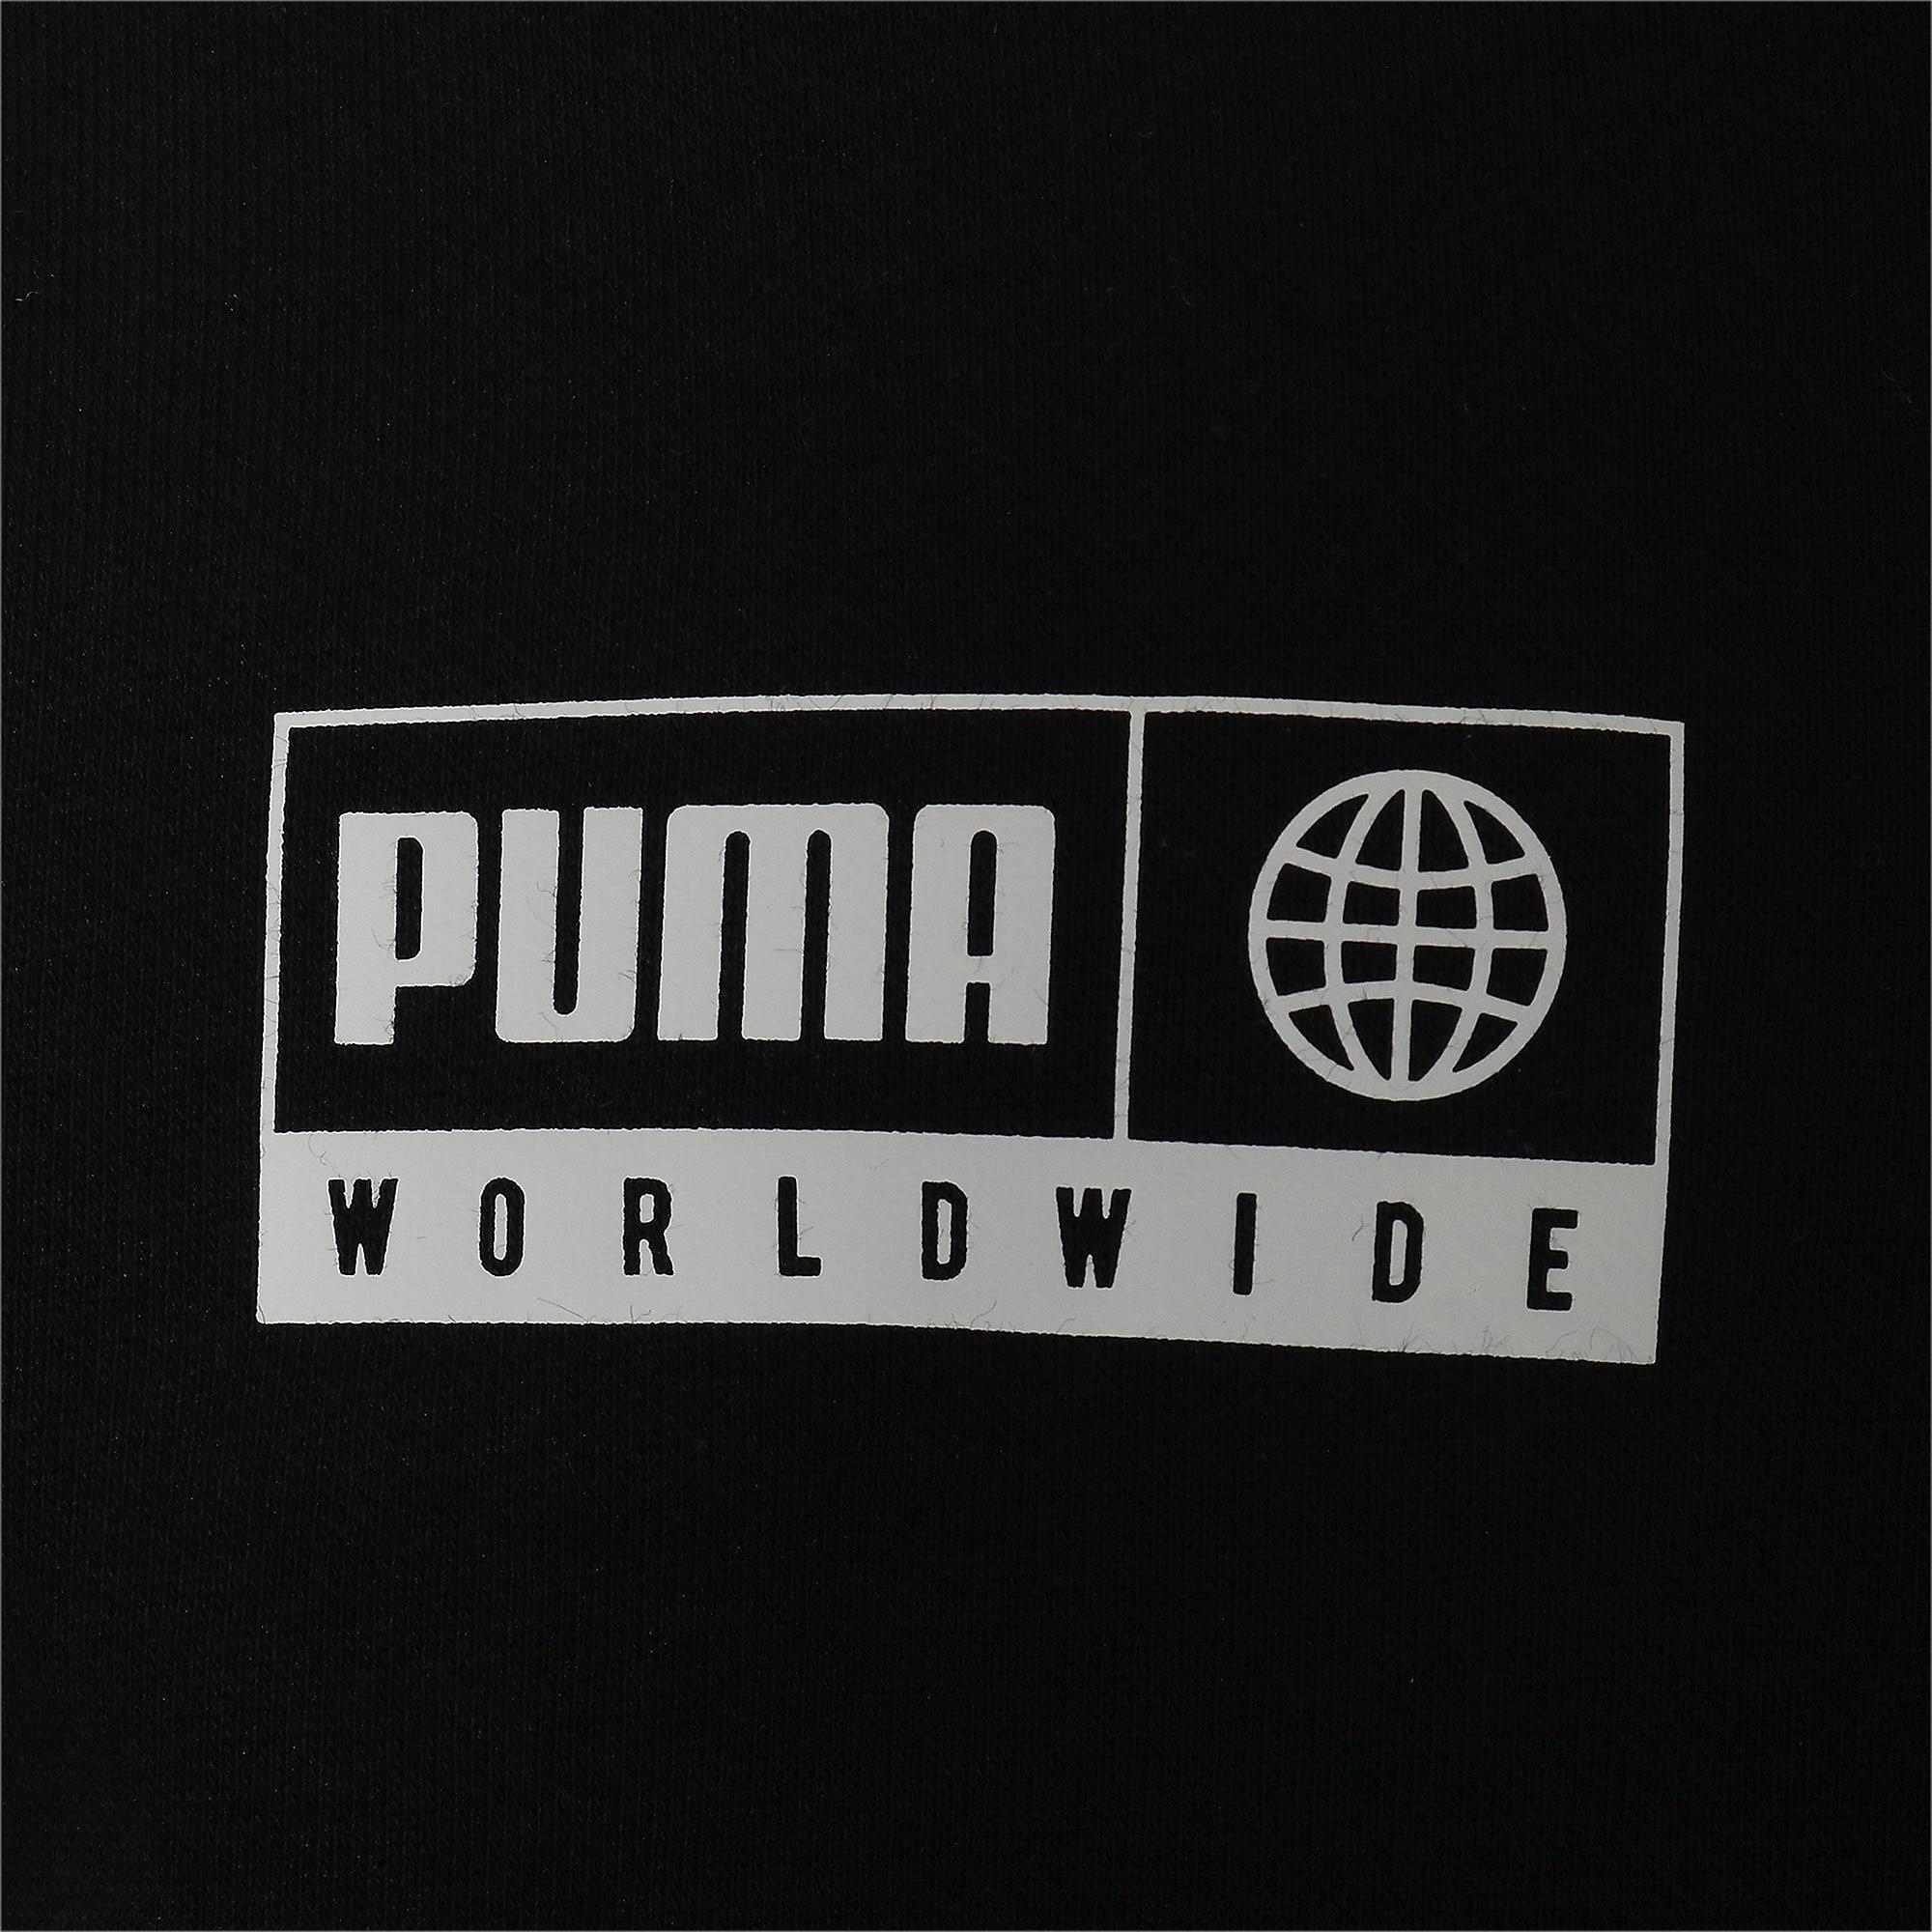 Thumbnail 8 of キッズ アルファ グラフィック フルジップ FL, Puma Black, medium-JPN